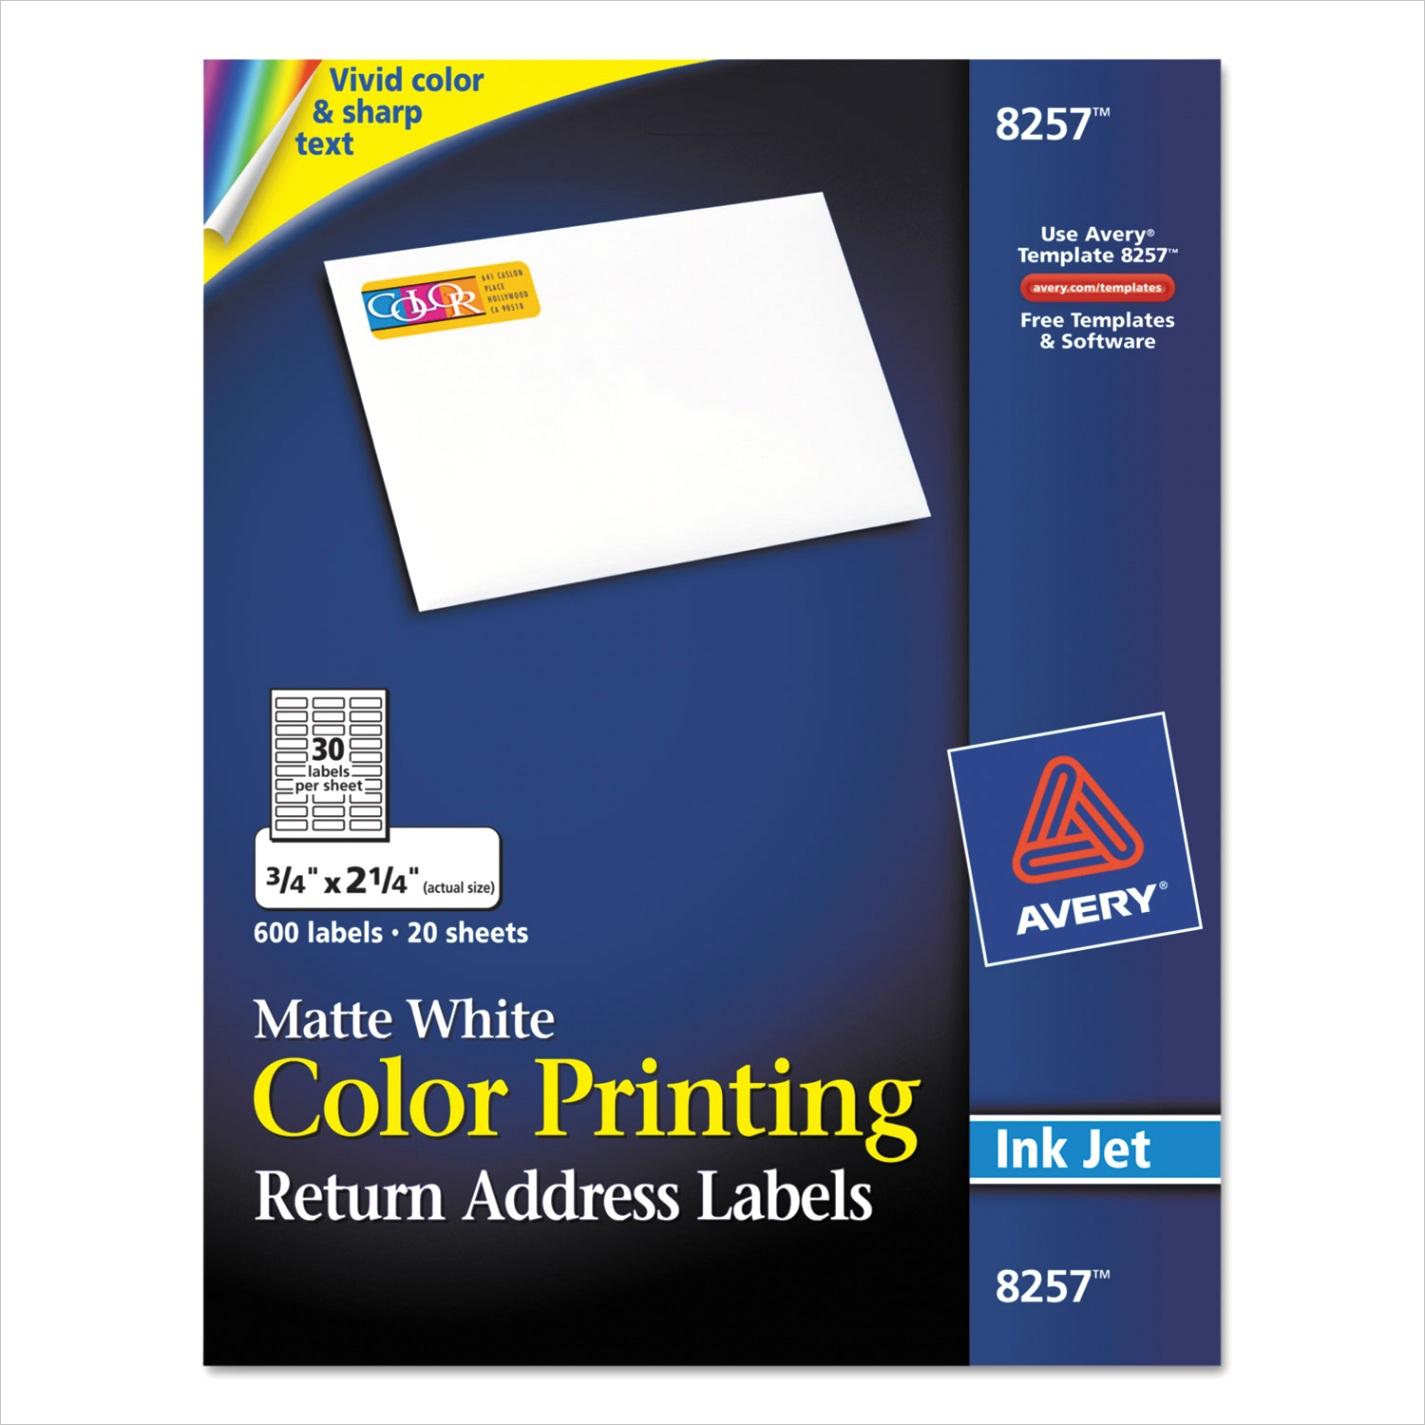 Vibrant Color Printing Mailing Labels Inkjet Printers 075 x 225 Matte White 30Sheet 20 SheetsPack AVE8257x